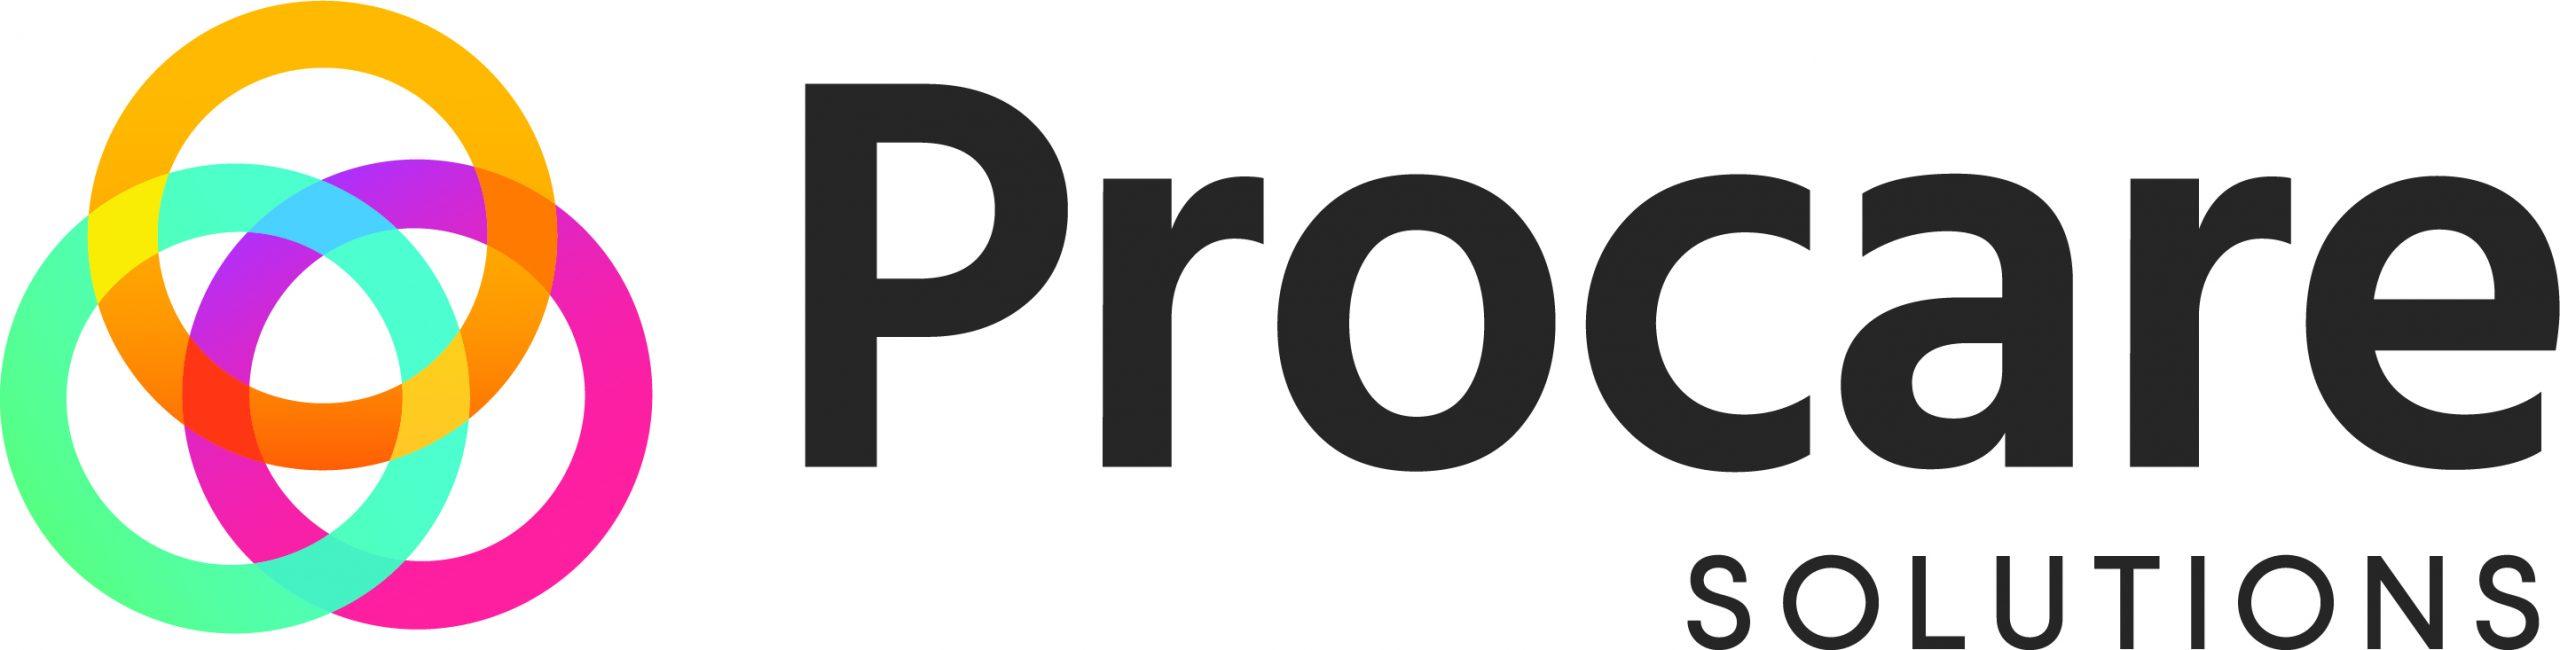 https://ildocc.org/wp-content/uploads/2021/01/ProcareSolutions-Logo-FullColor-Horiz-scaled.jpg